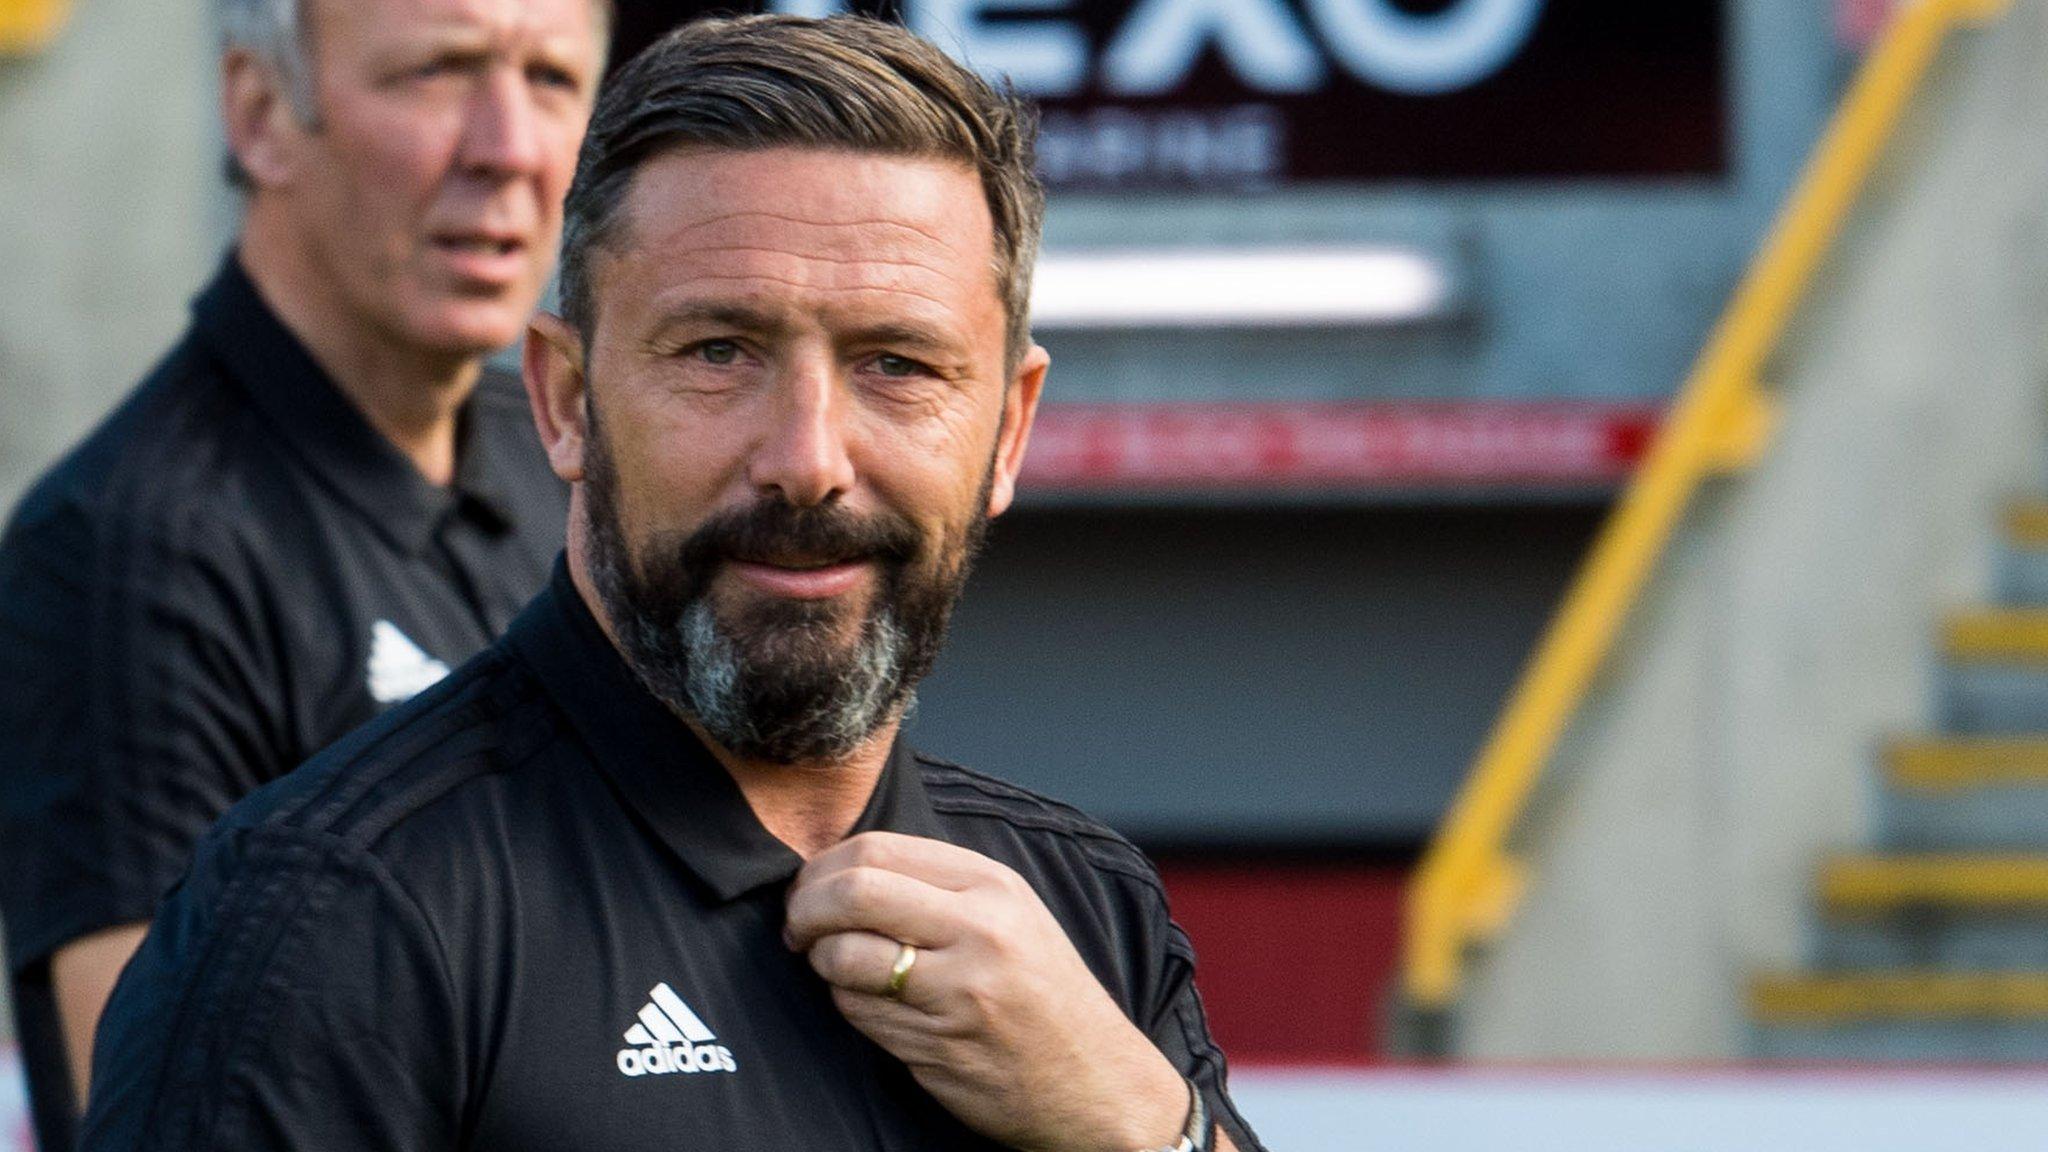 Hibernian v Aberdeen: 'We can go all the way' - McInnes